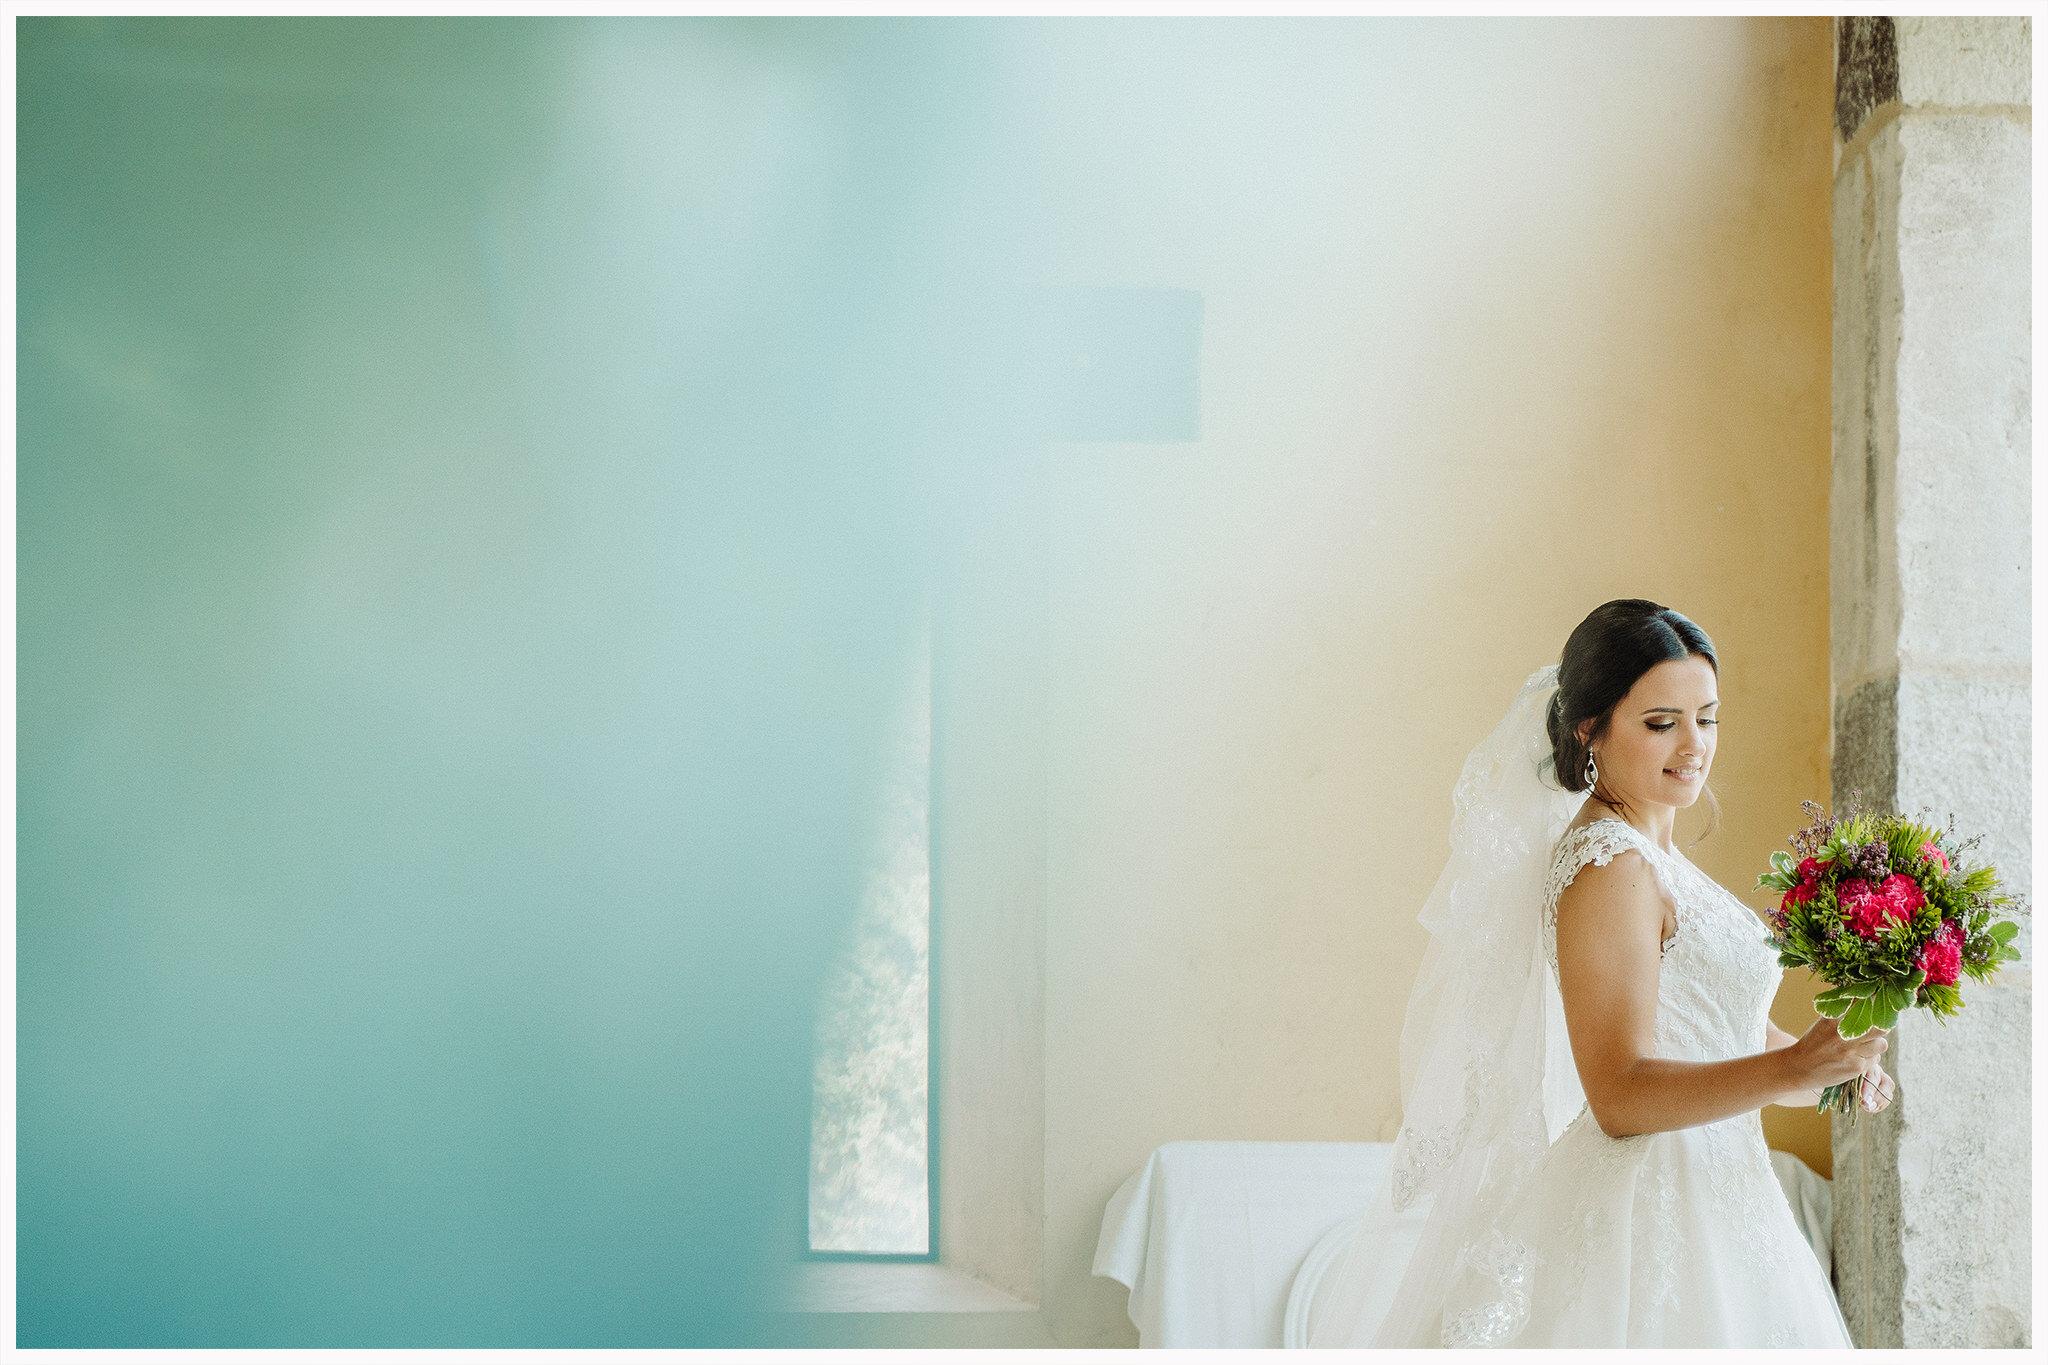 dreamsanddreamers.com-o-nunta-frumoasa-28.jpg